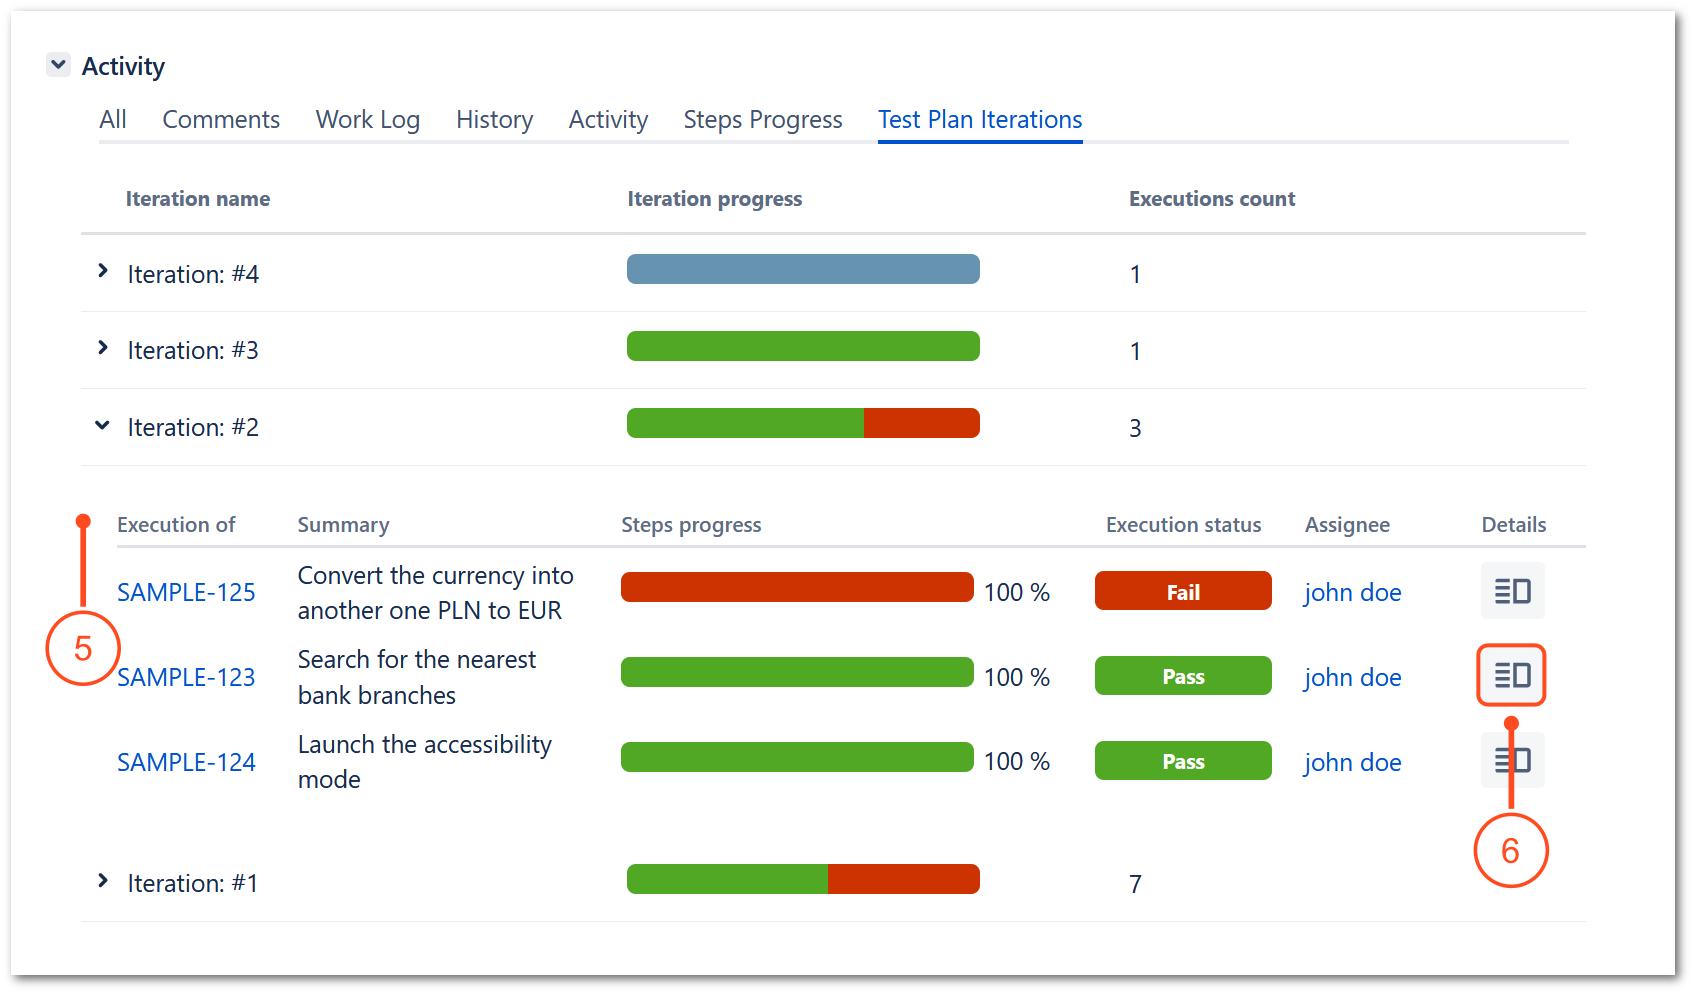 Test Plan iterations tab